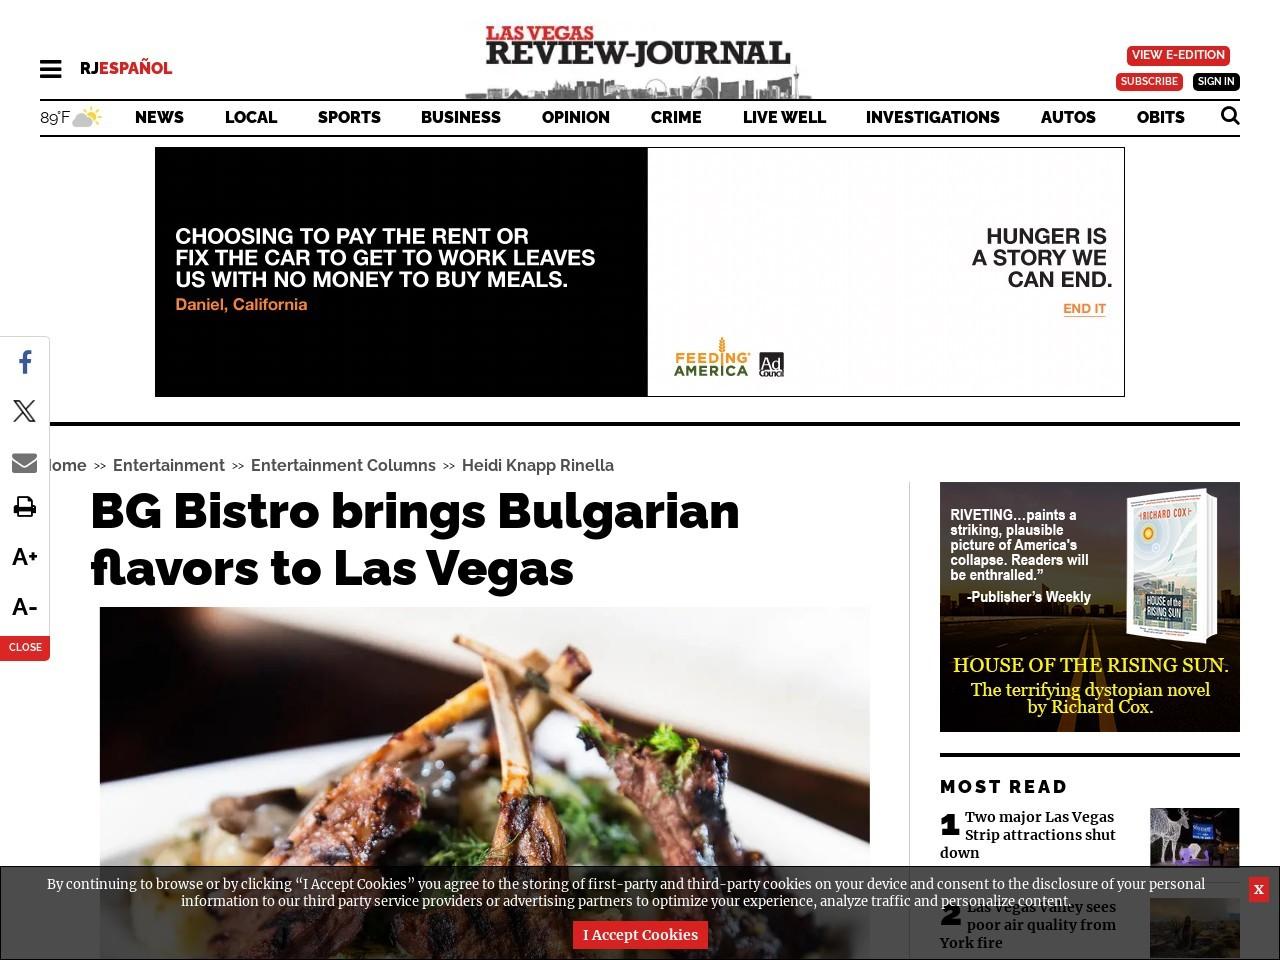 BG Bistro brings Bulgarian flavors to Las Vegas